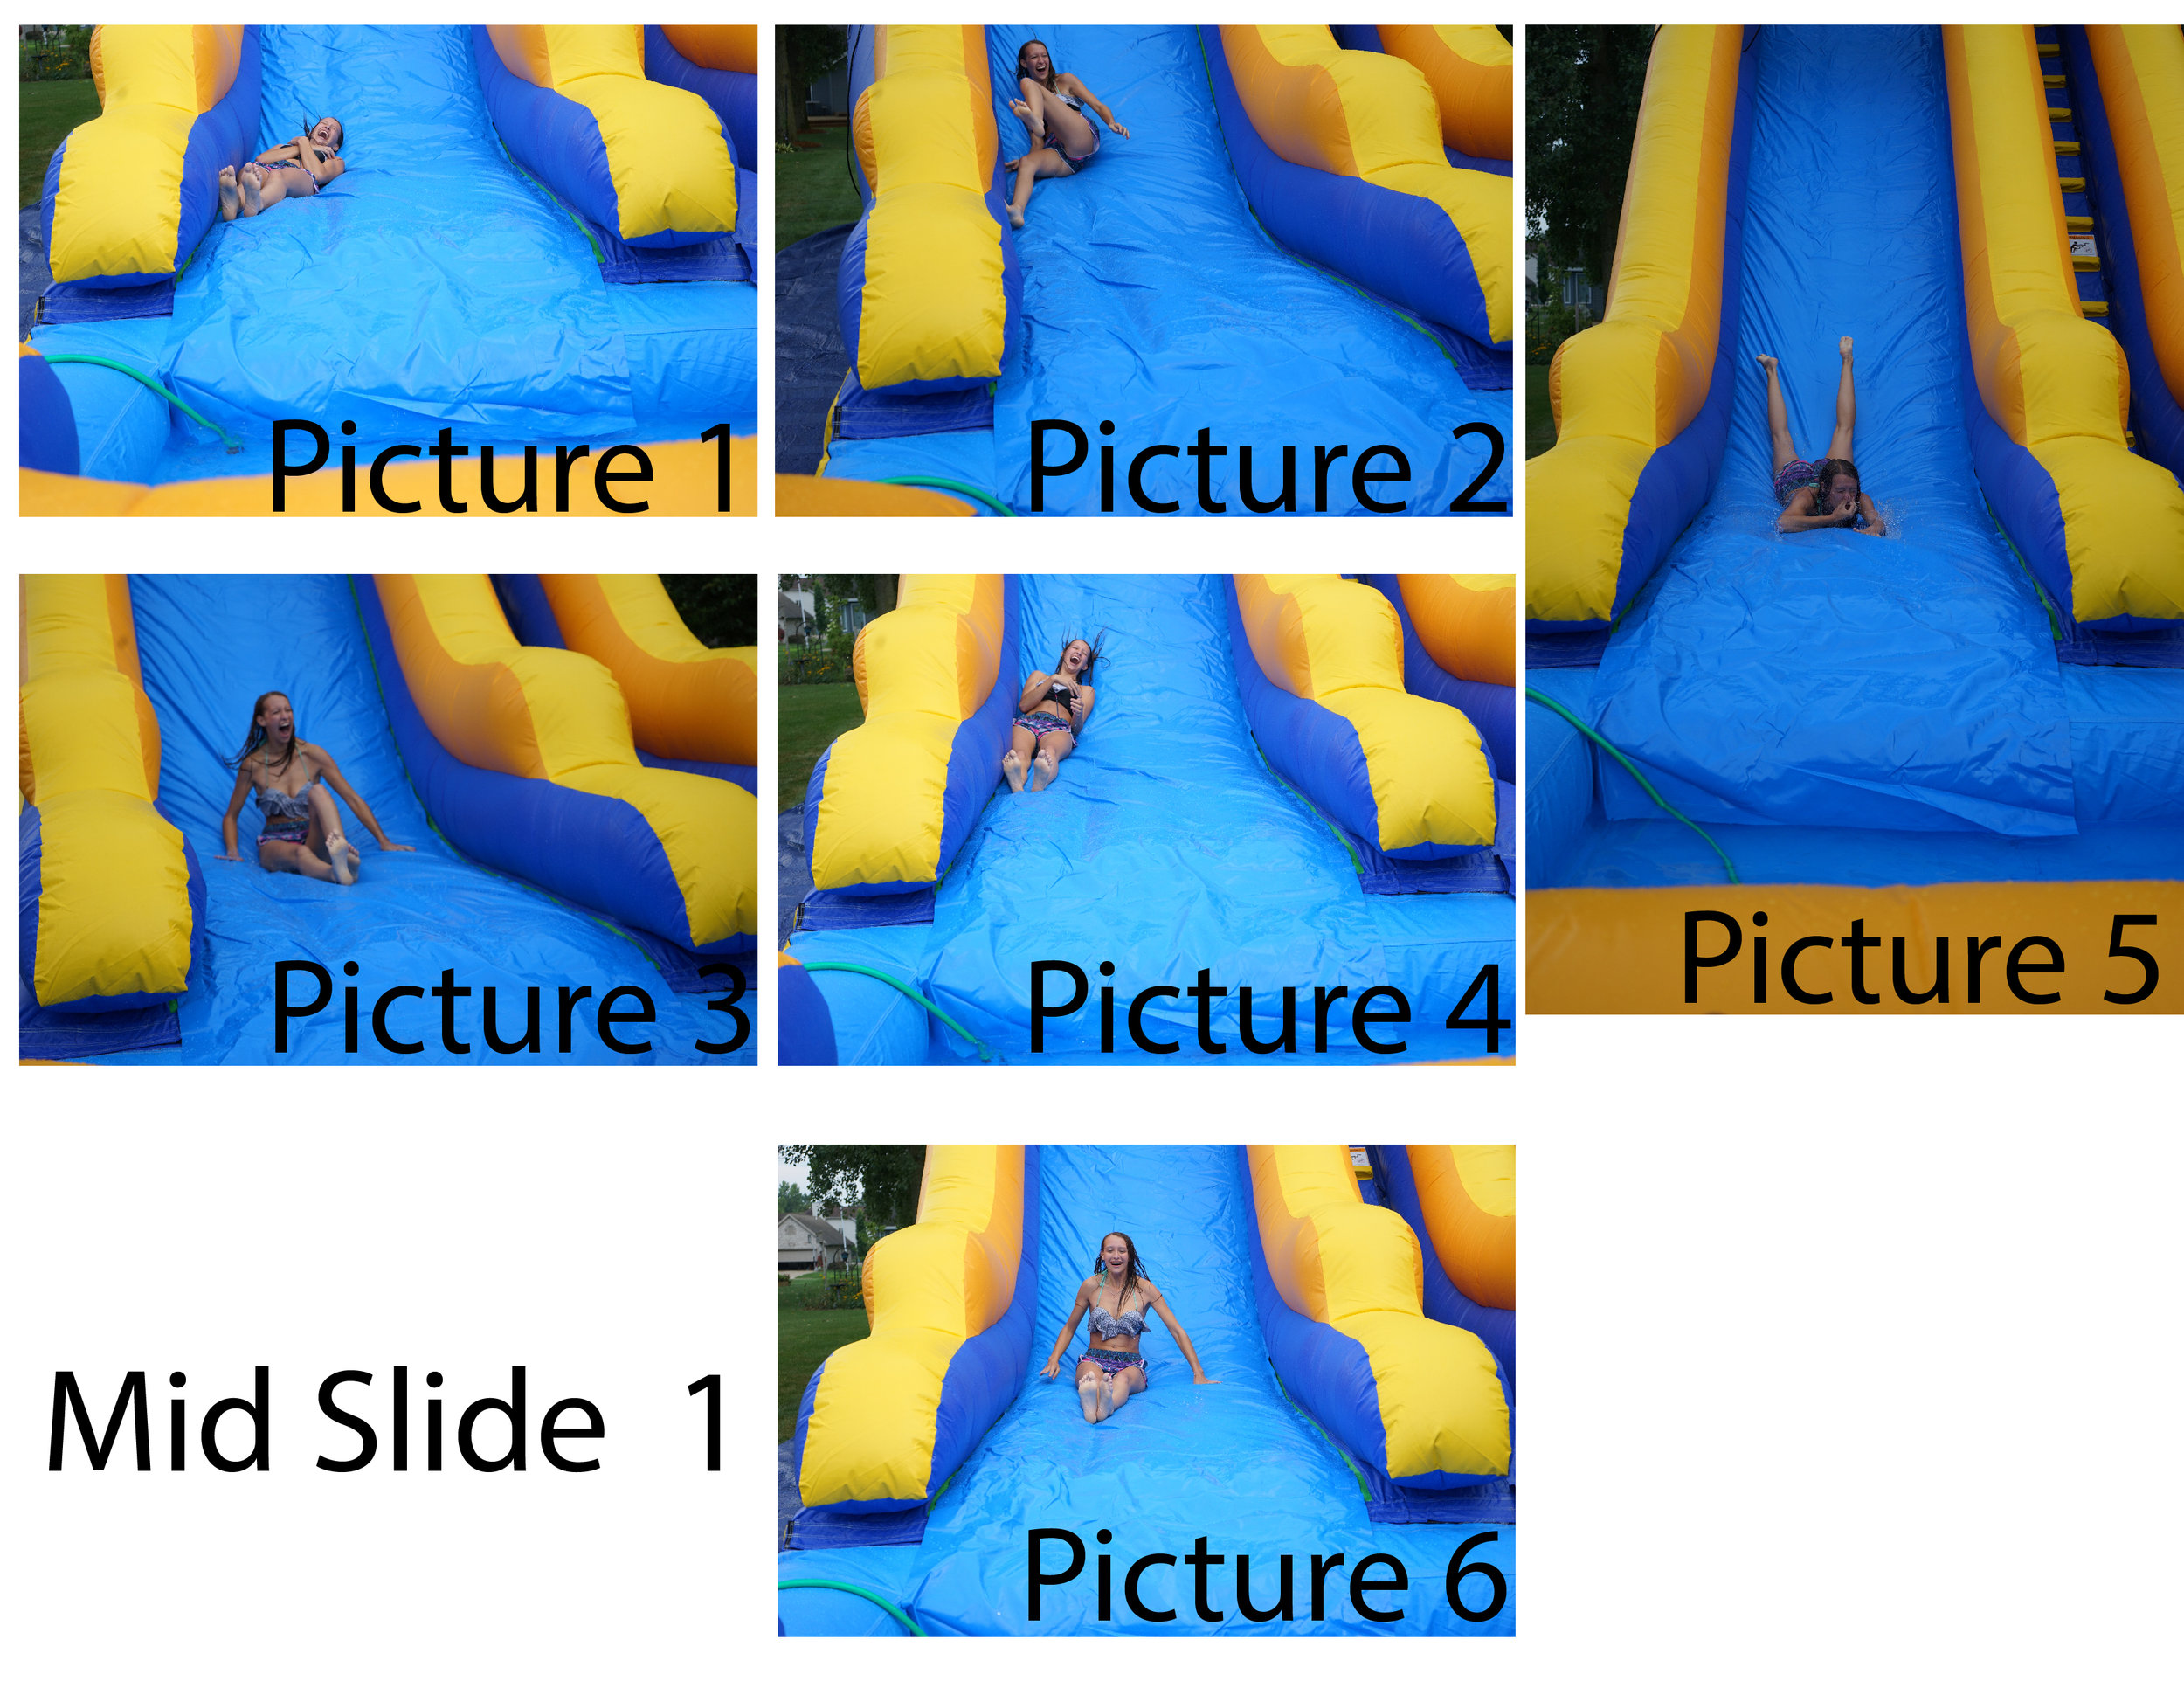 Slide Image Test-01.jpg